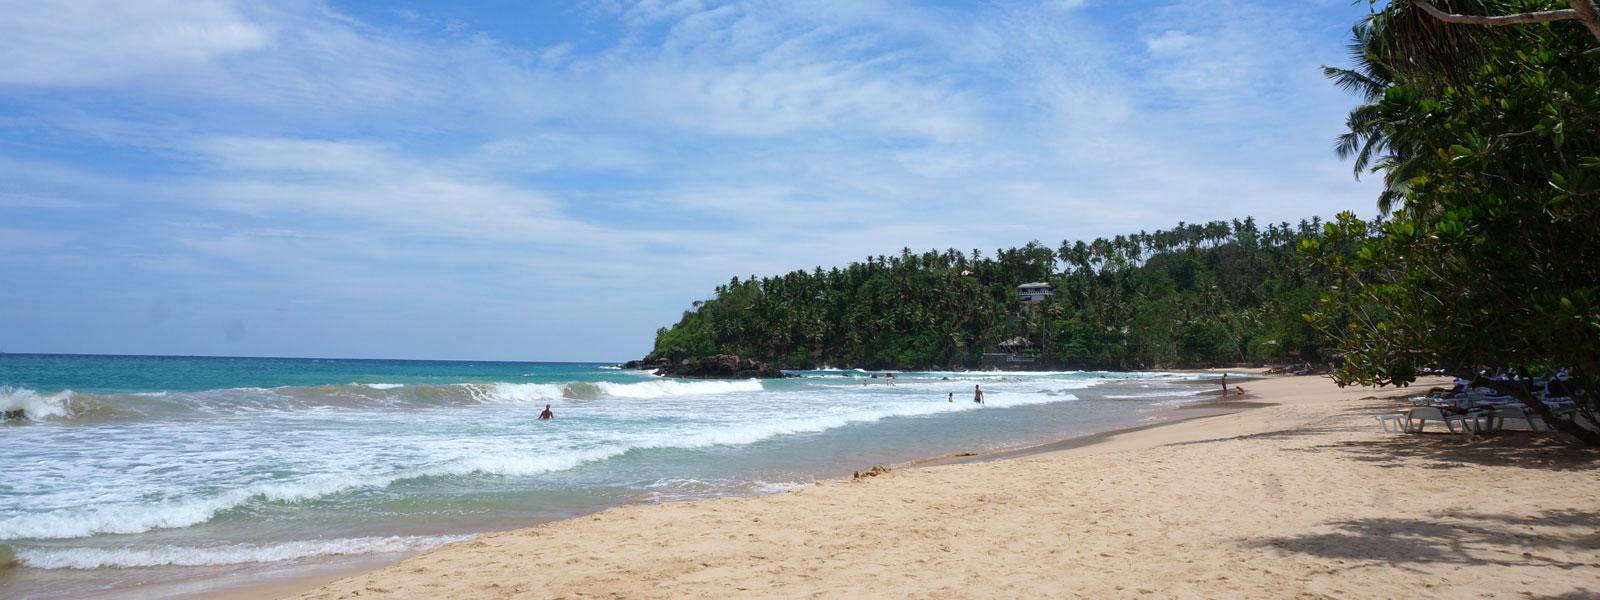 Srilanka Beach Trips